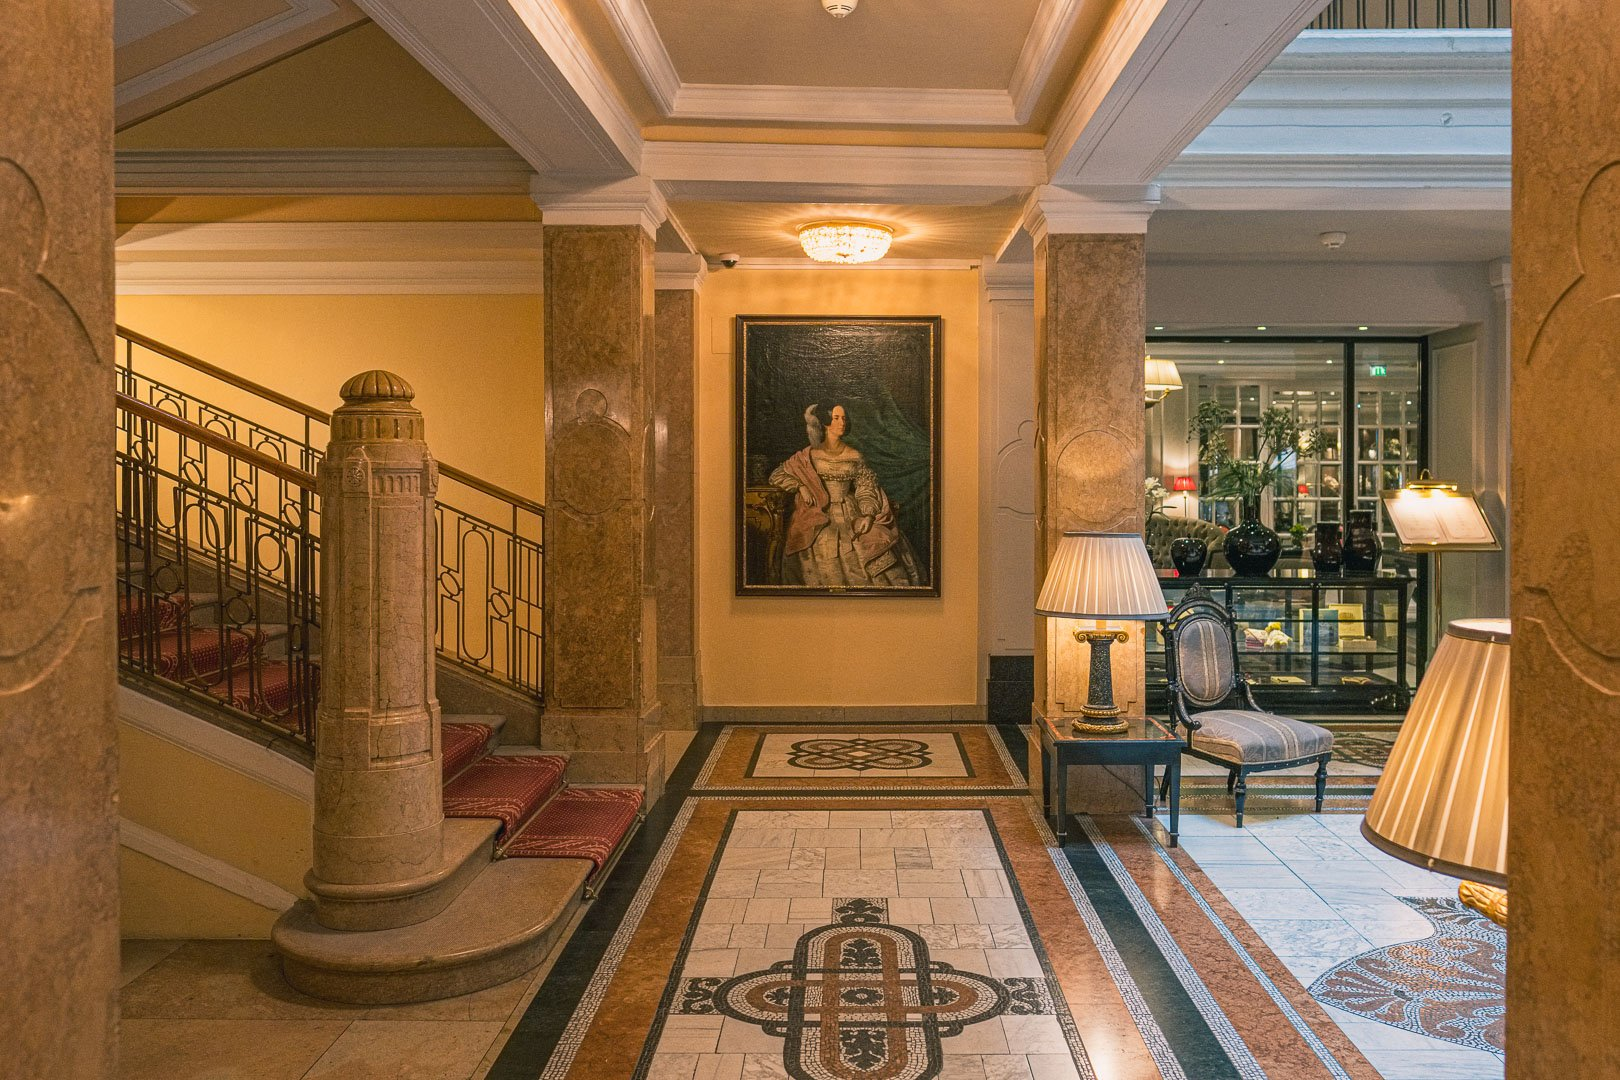 Lobby of the Hotel Sacher Salzburg